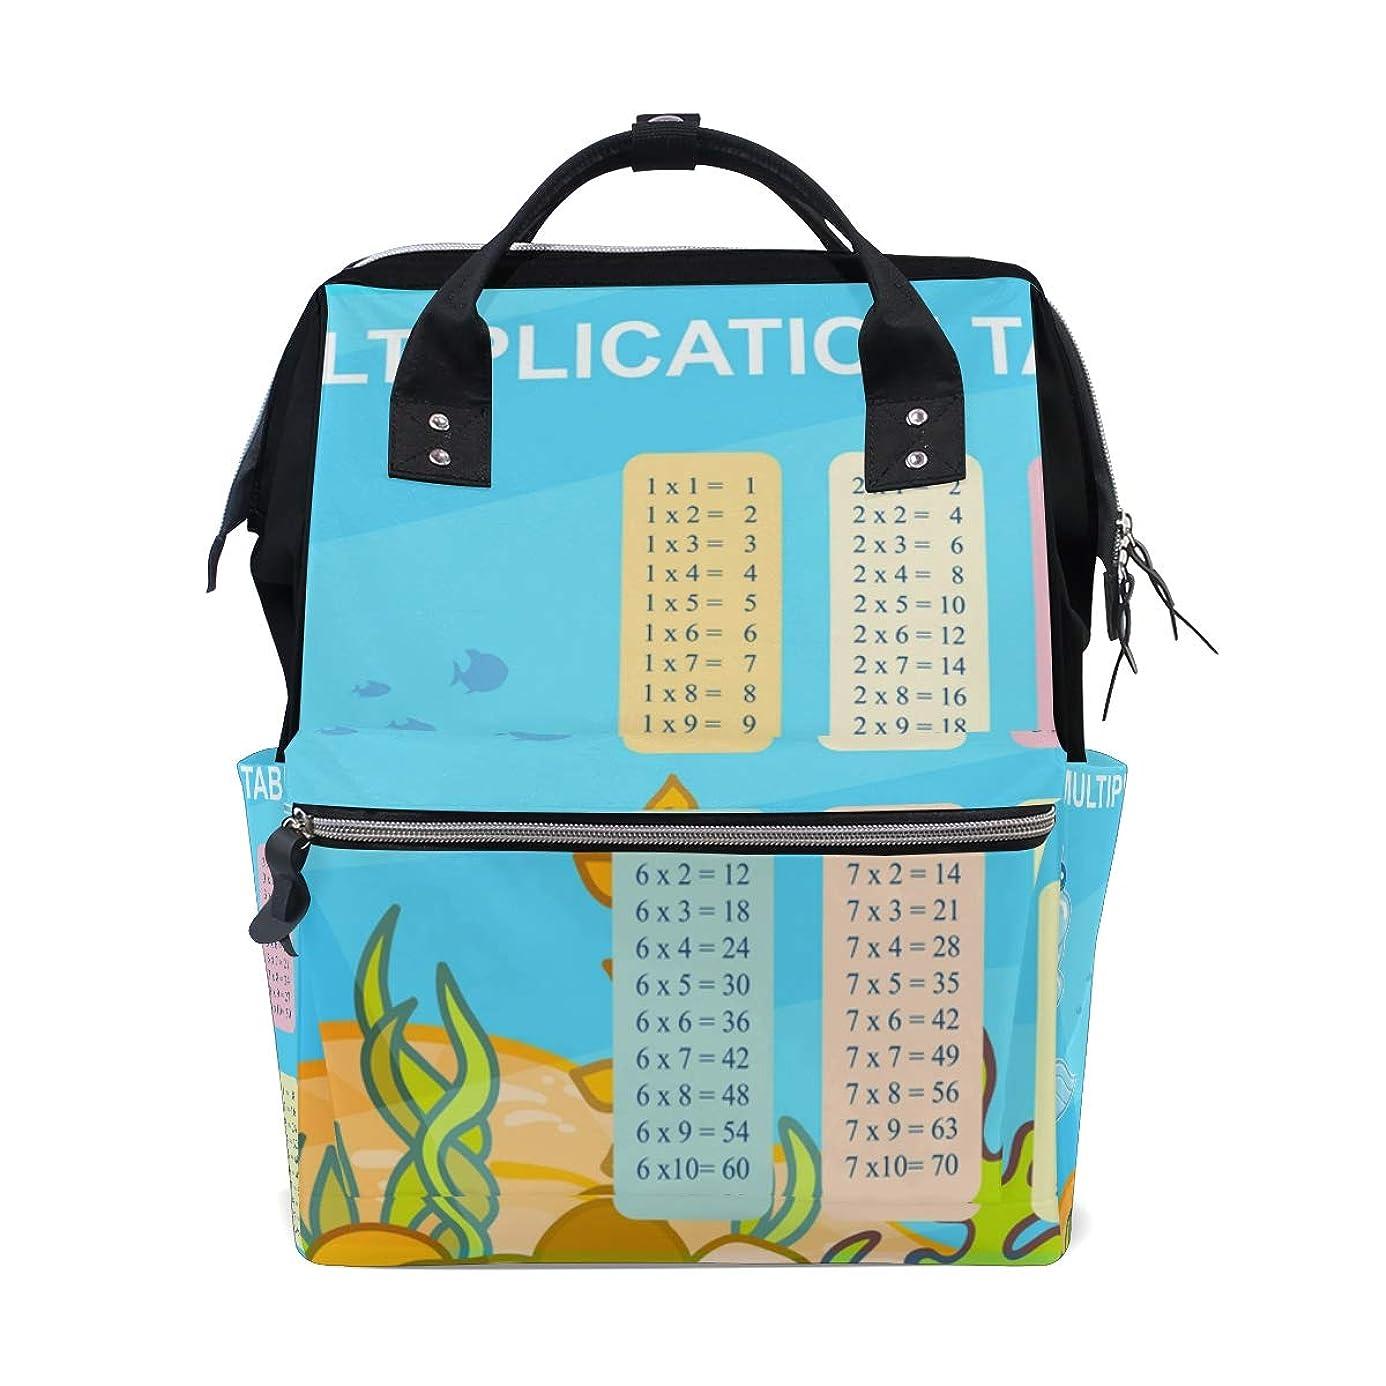 Multiplication Table School Backpack Large Capacity Mummy Bags Laptop Handbag Casual Travel Rucksack Satchel For Women Men Adult Teen Children ula3250232